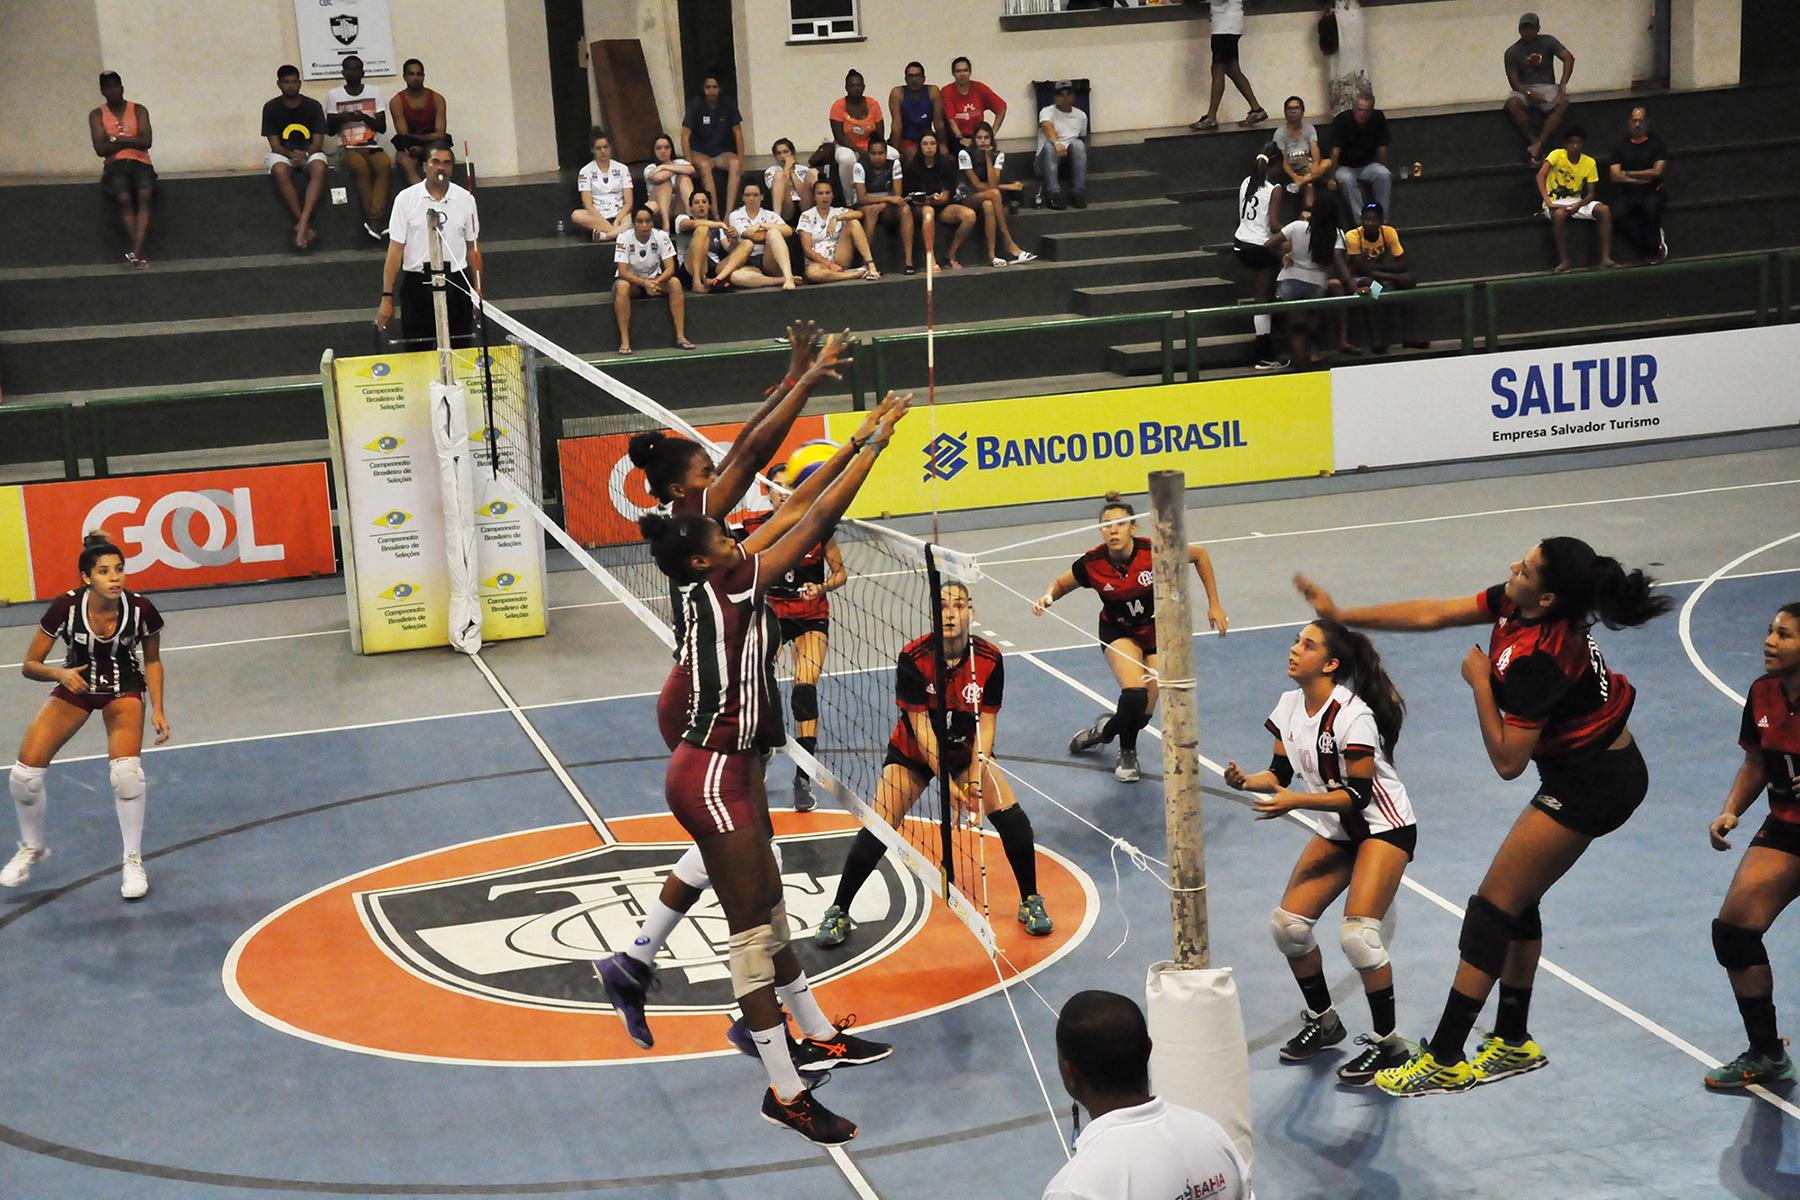 Semifinalistas definidos com cariocas, paulistas e catarinenses